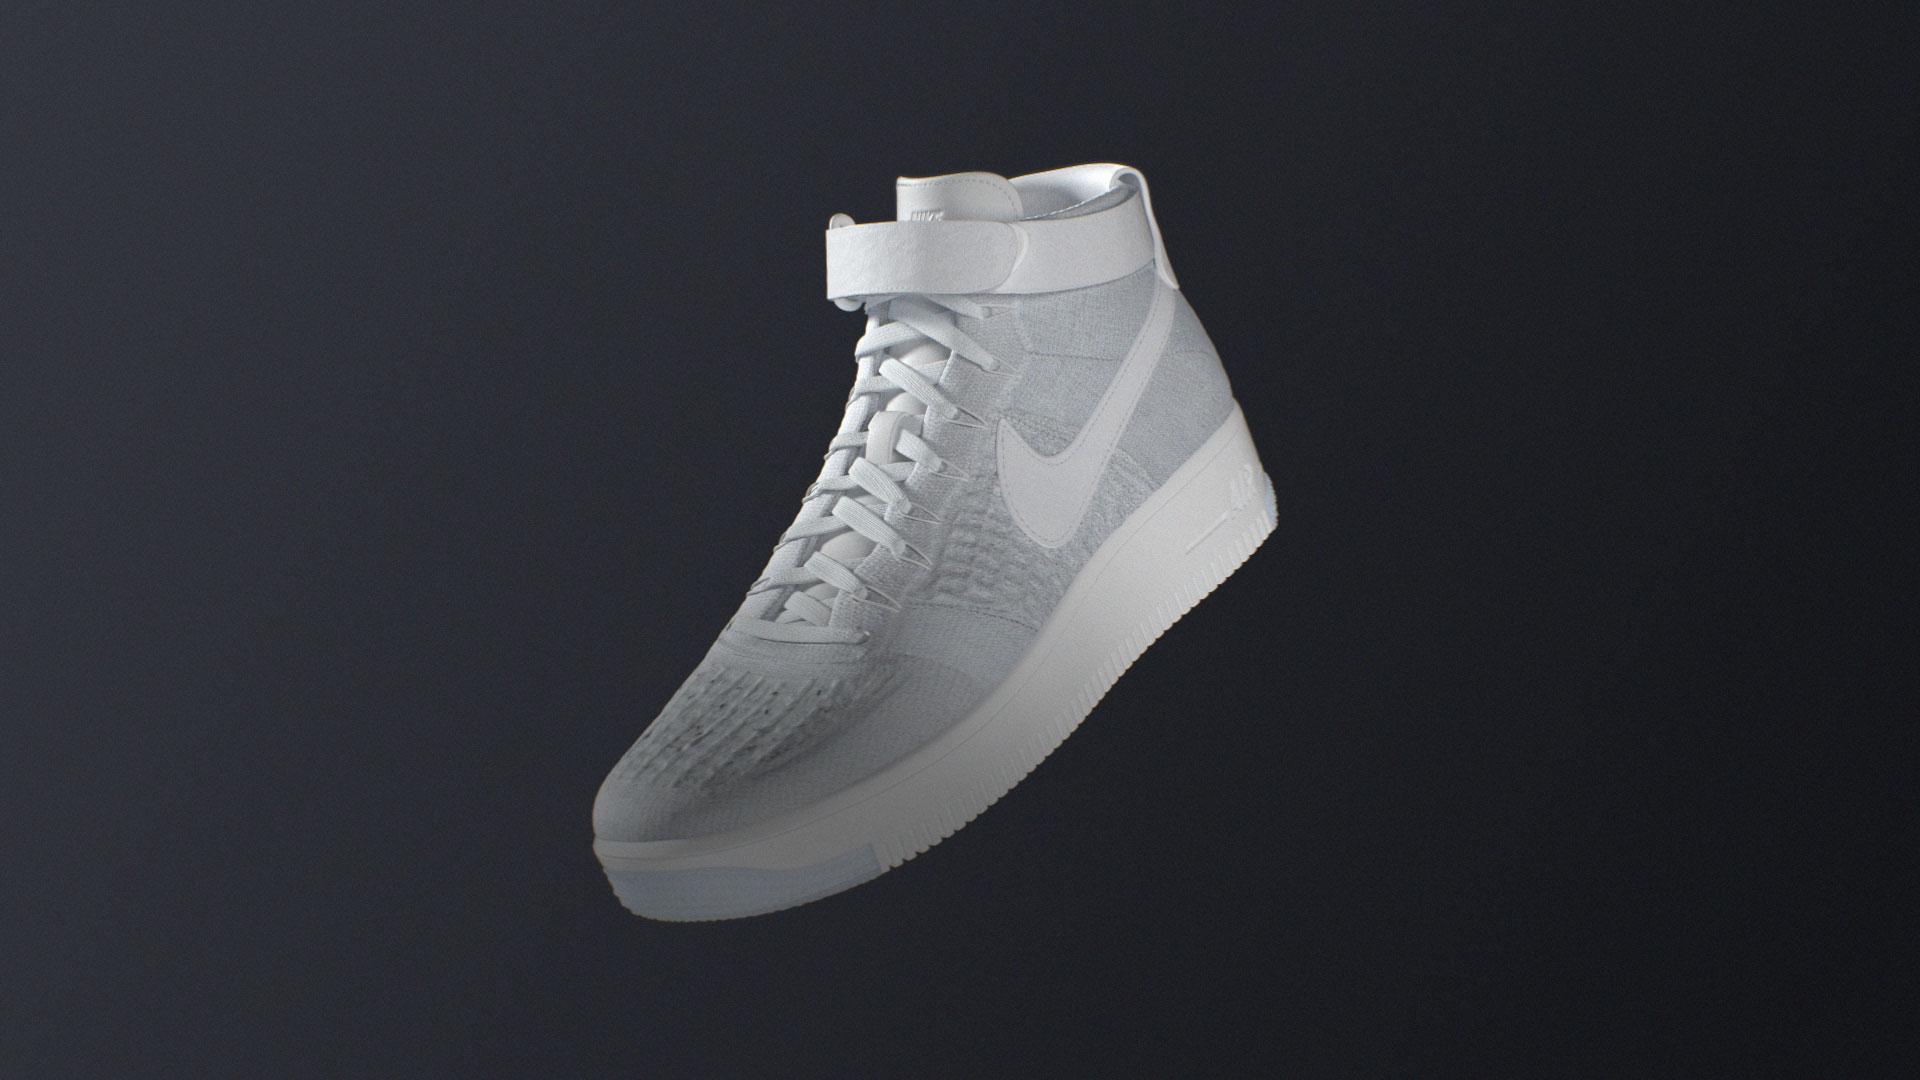 Nike Flyknit sport 3d cgi Air force 1 shoe